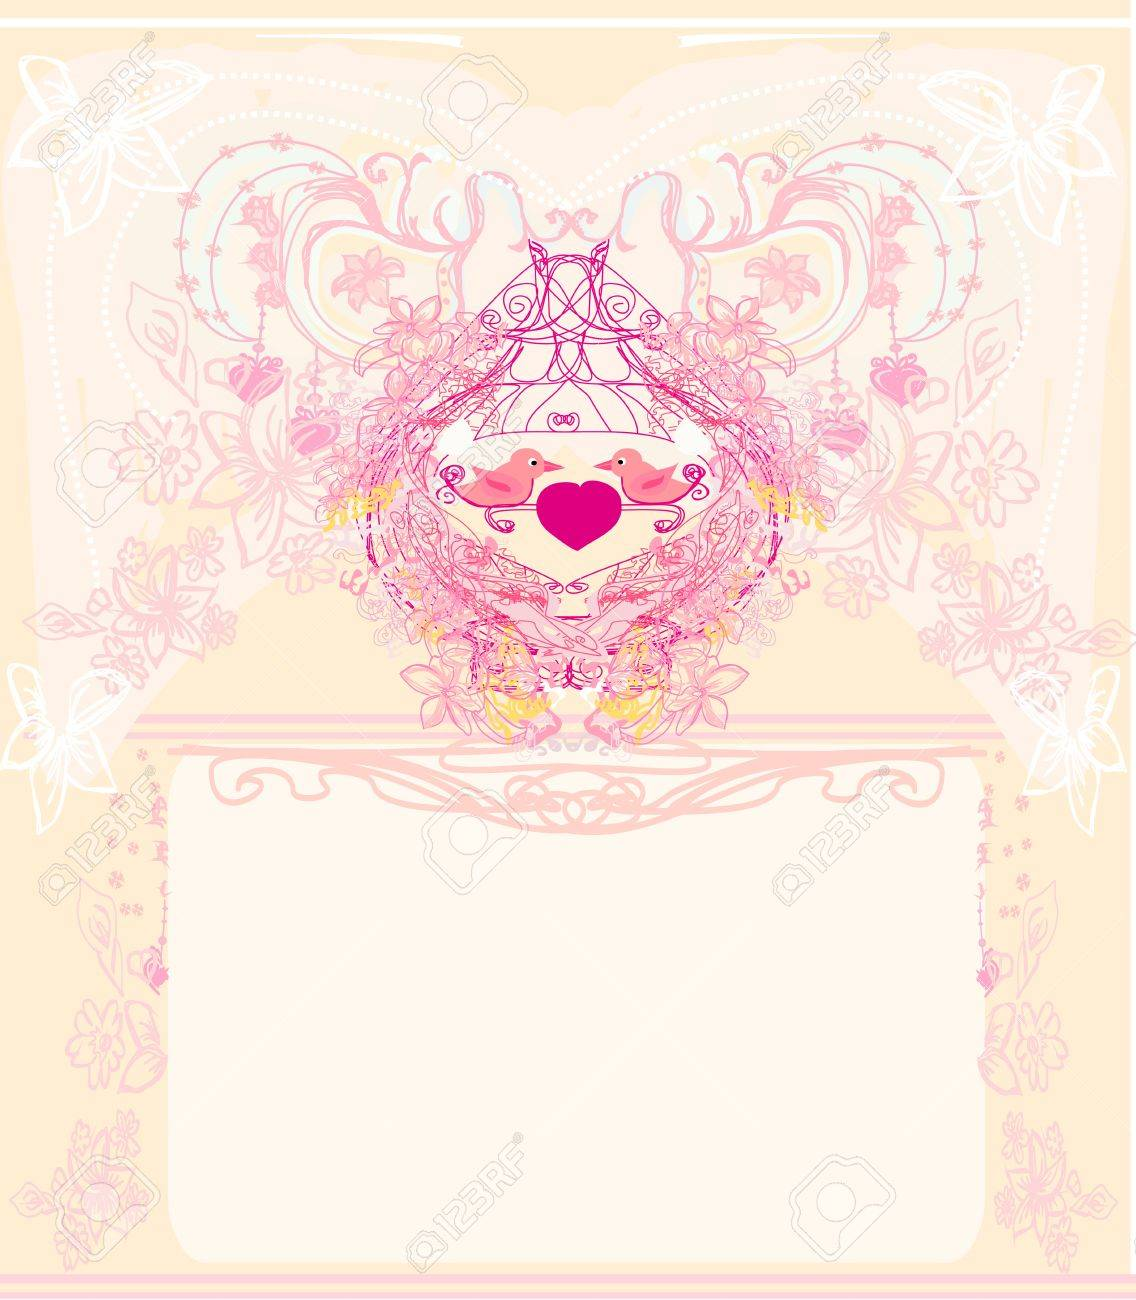 Greeting Card With 2 Sweet Love Birds Wedding Invitation Royalty